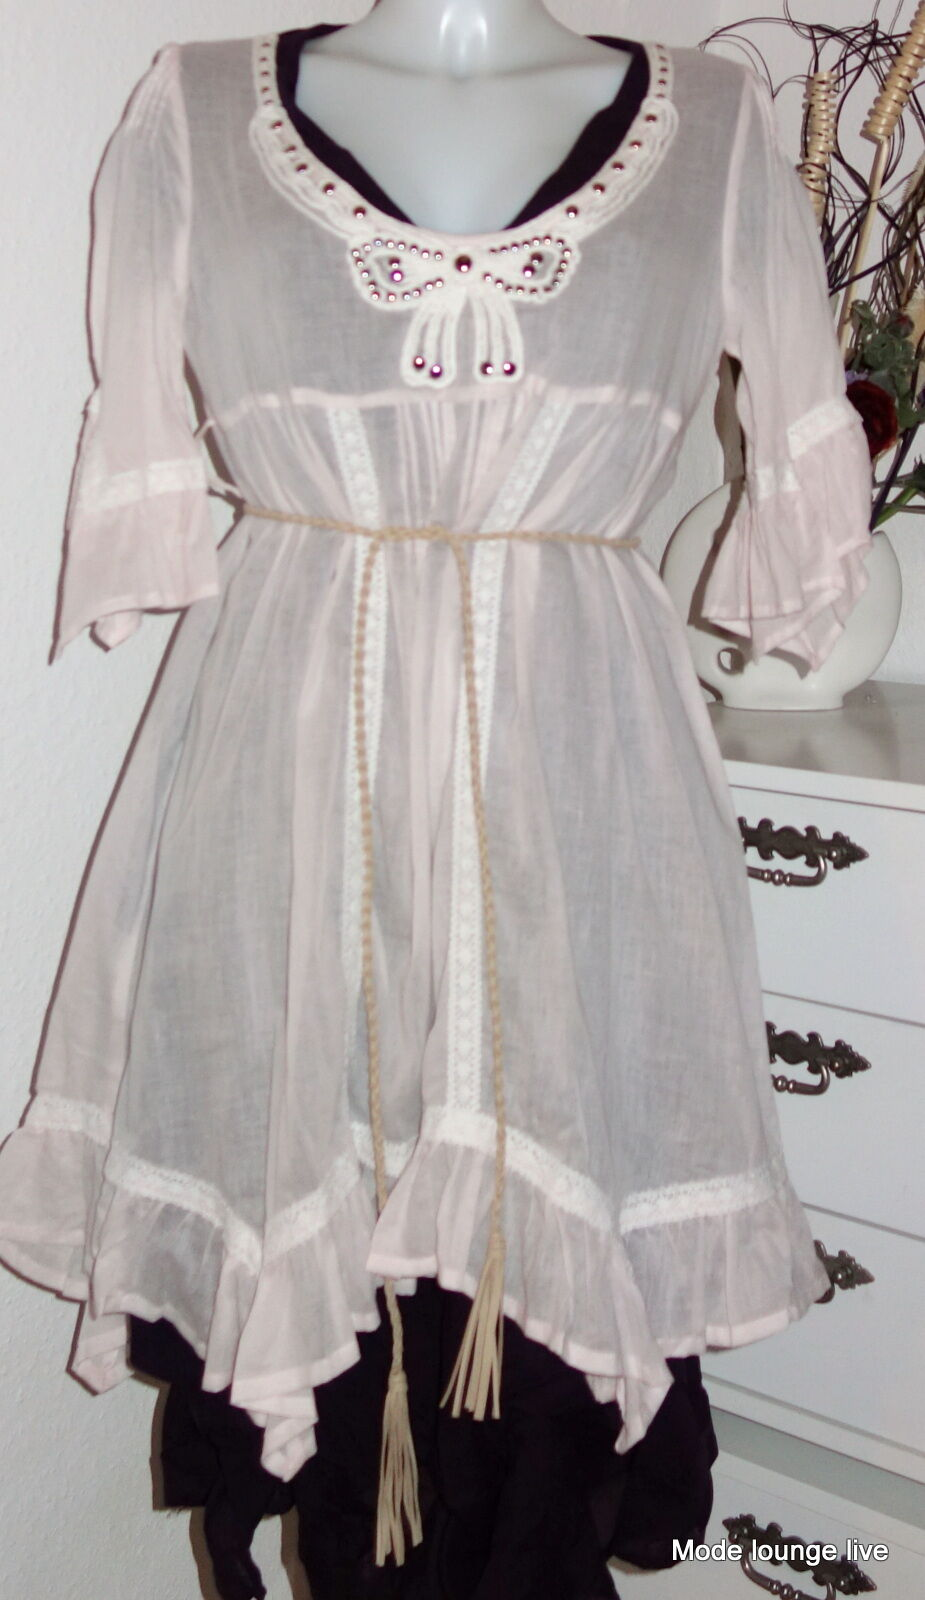 Ester Elenora Tunika Zipfel-Kleid kajsa Ballon dress Rosa pudrig Rosa 36 38 40